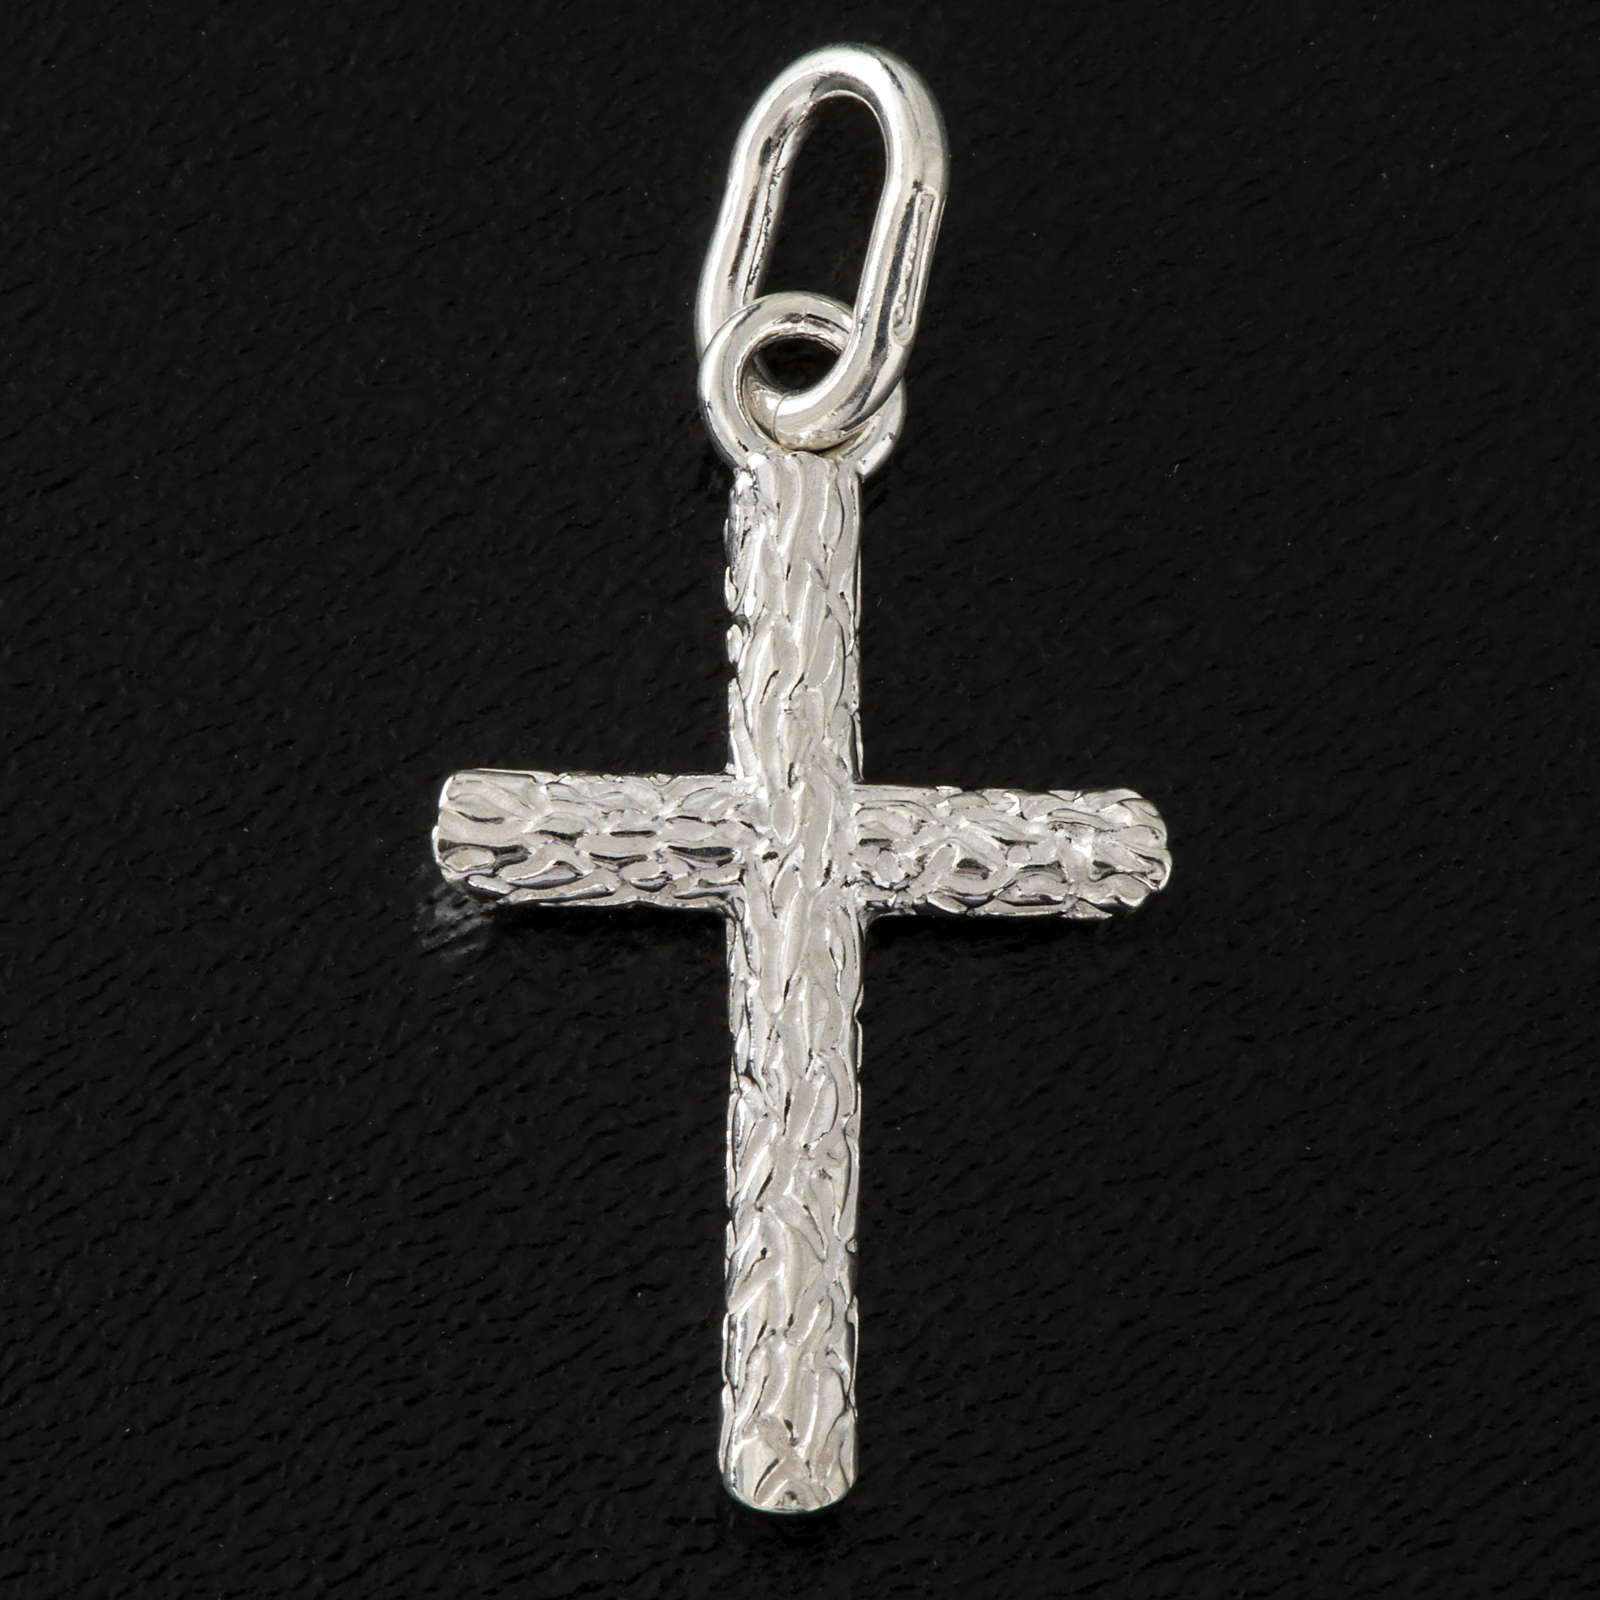 Cruz trabalhada prata 925 2,5 cm 4